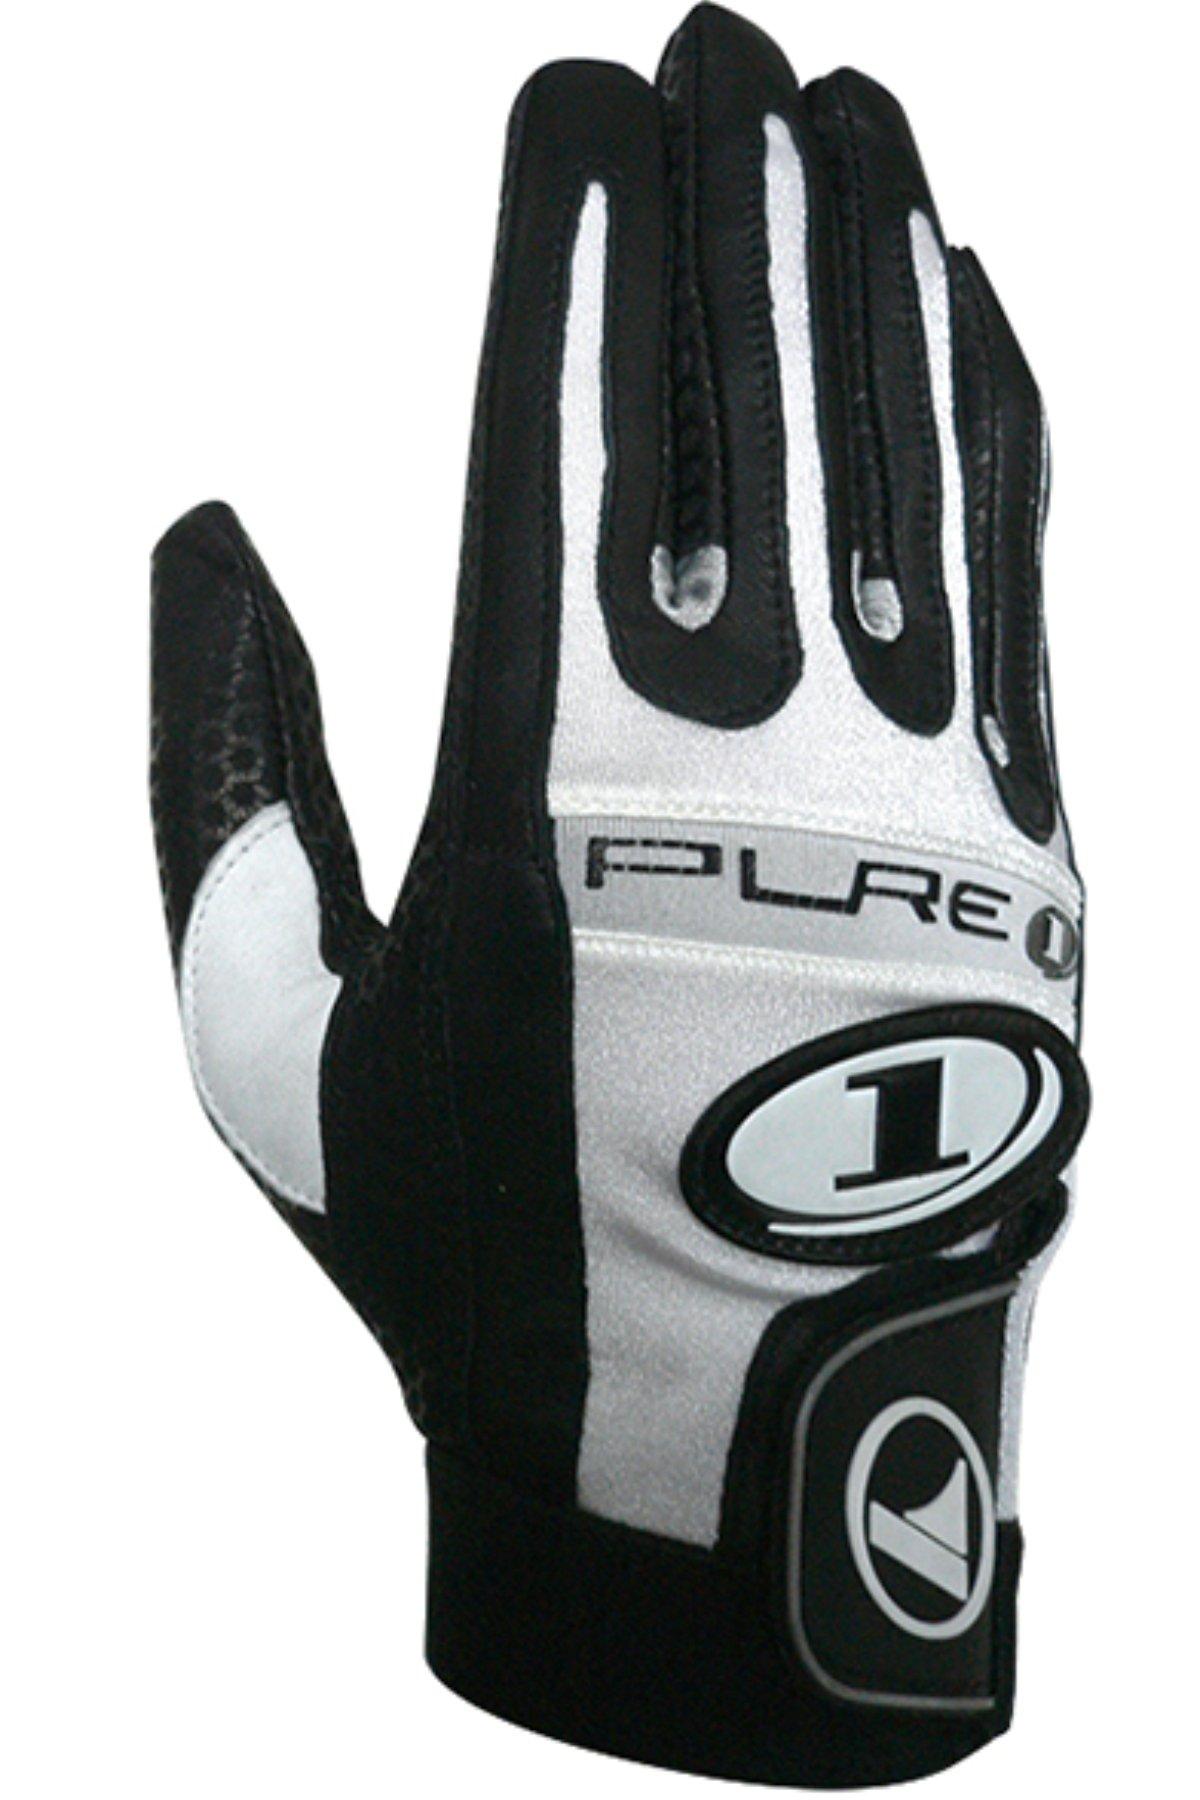 ProKennex Pure 1 (Black) Racquetball Glove (RH-XL)